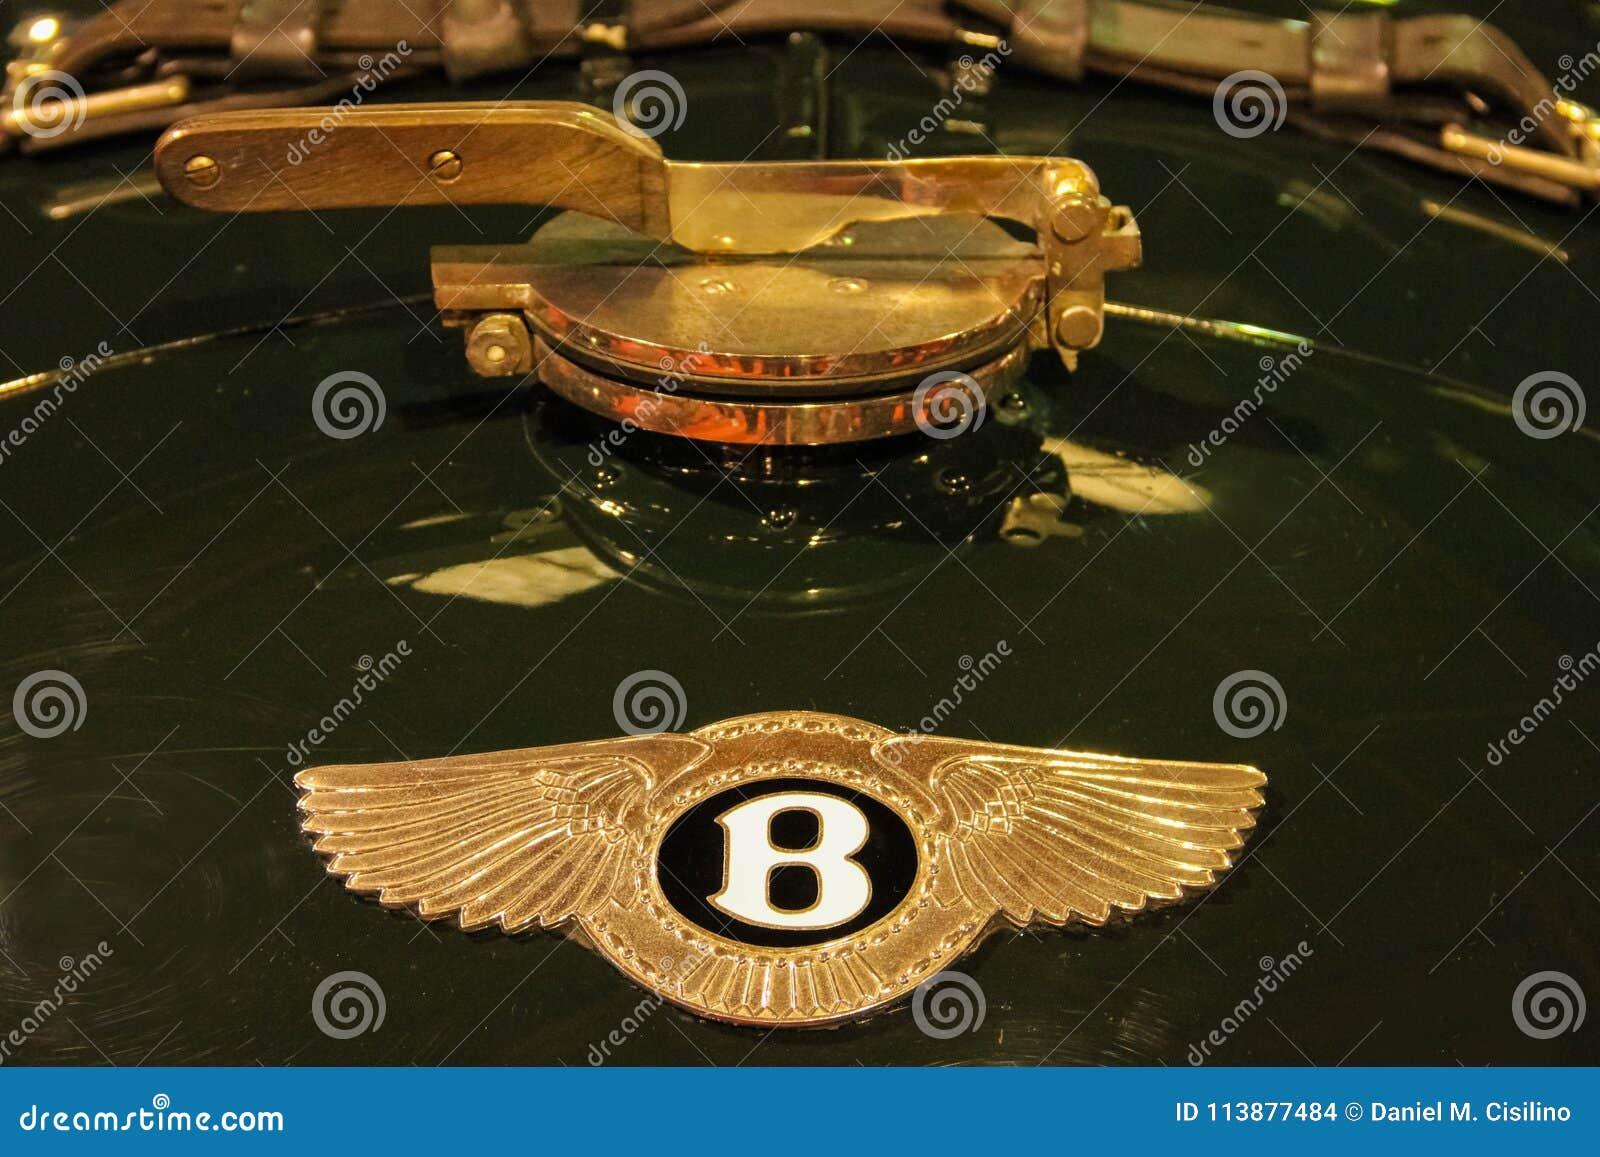 Vintage Car Bentley Emblem Editorial Stock Image Image Of Classic Automotive 113877484